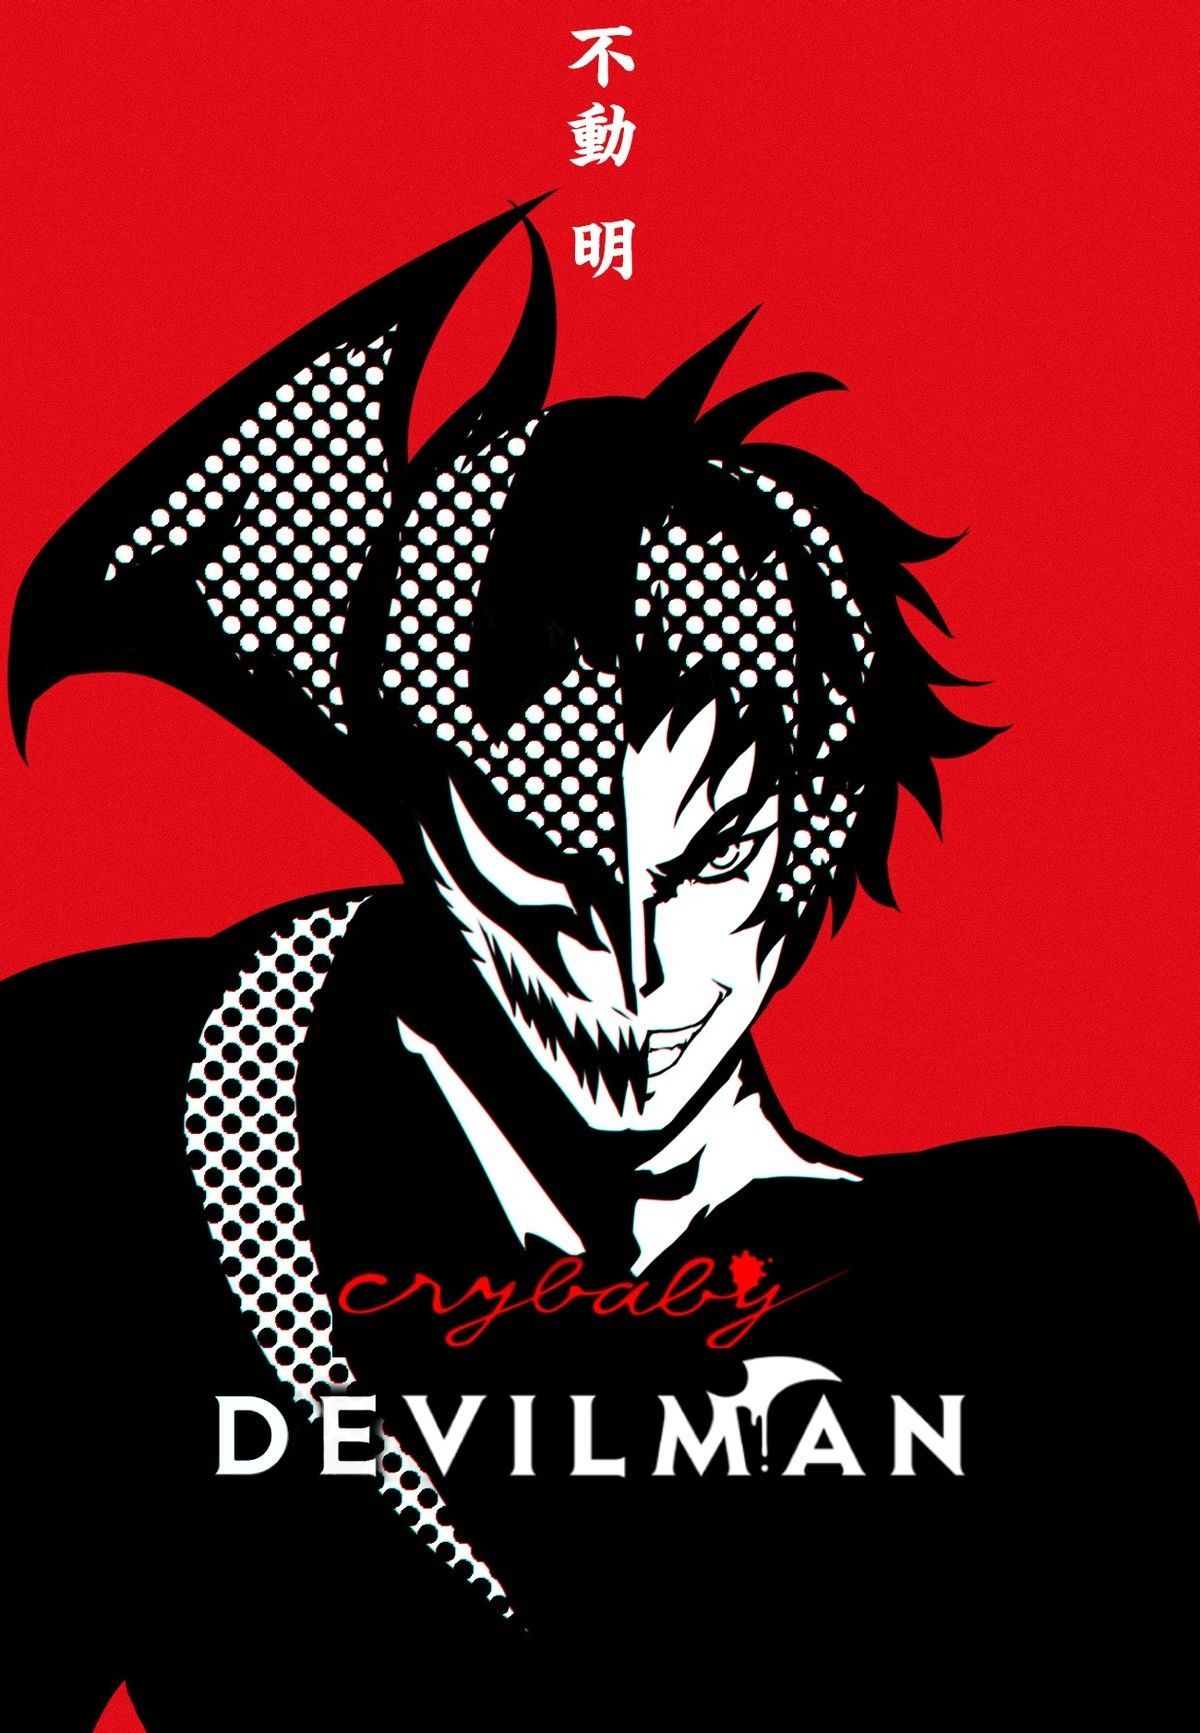 Devilman Crybaby watch this show please Devilman